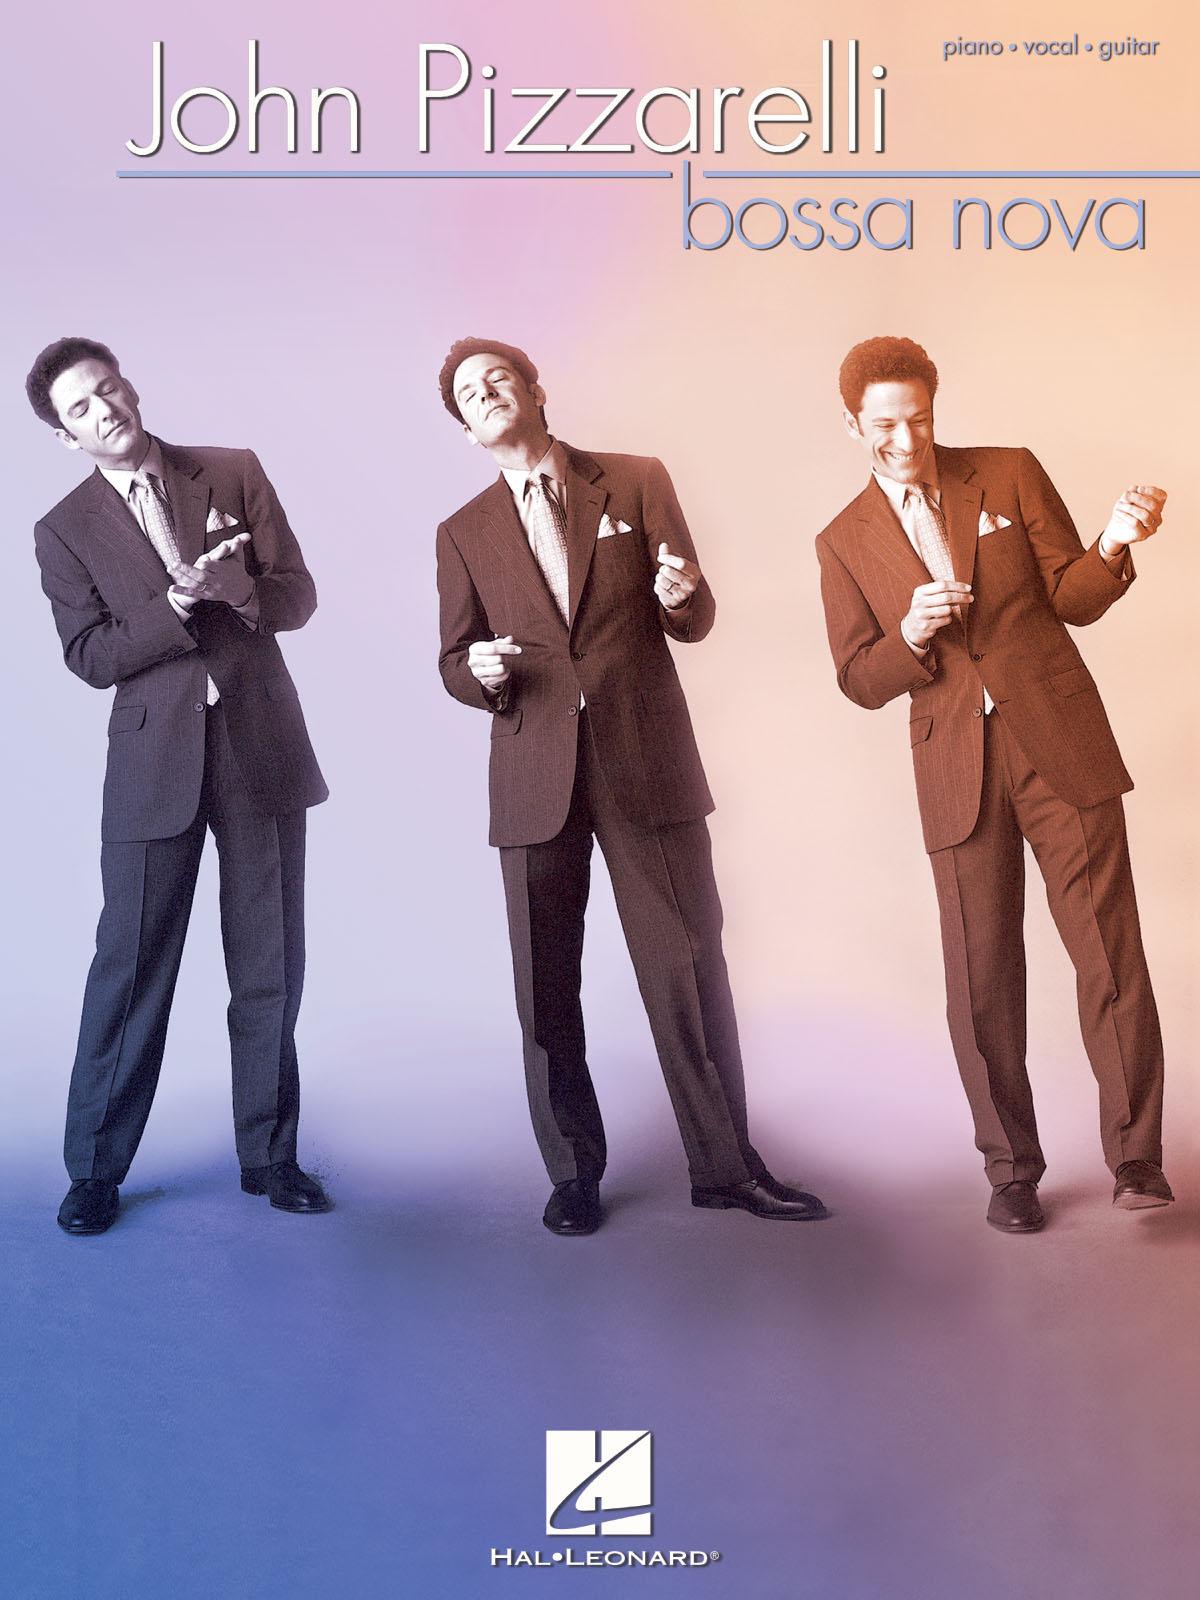 John Pizzarelli: John Pizzarelli - Bossa Nova: Piano  Vocal and Guitar: Mixed